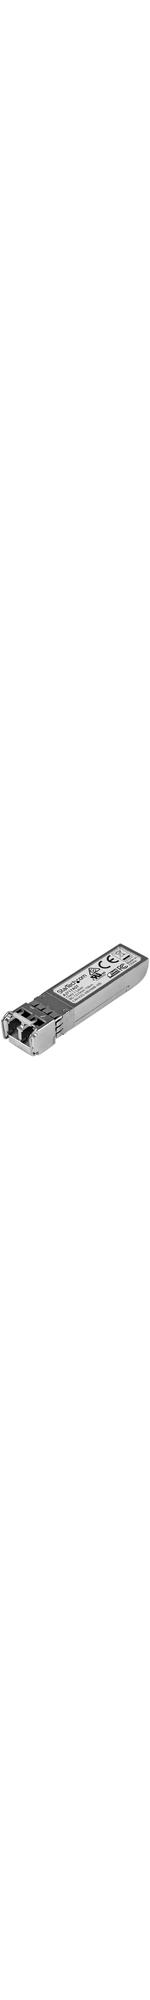 StarTech.com HP AJ717A Compatible SFP Module - 8GFC Fiber Optical SFP Transceiver - Lifetime Warranty - 8 Gbps - Maximum Transfer Distance: 10 km 6.2 mi - 100% com